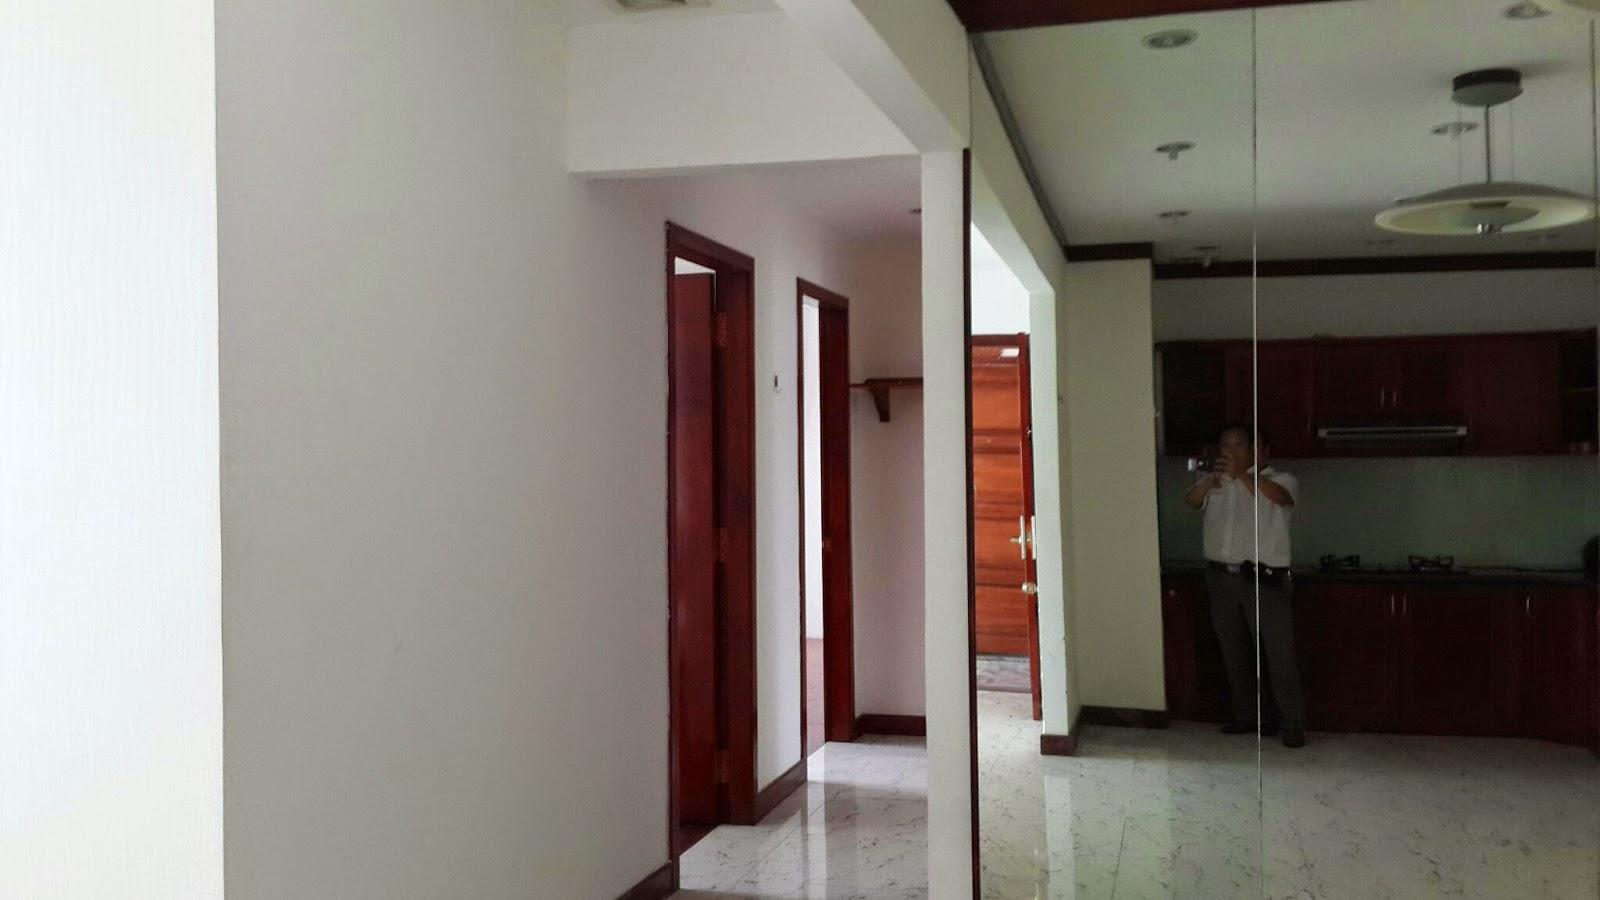 Eke interior design 2014 06 22 for Eke interior design